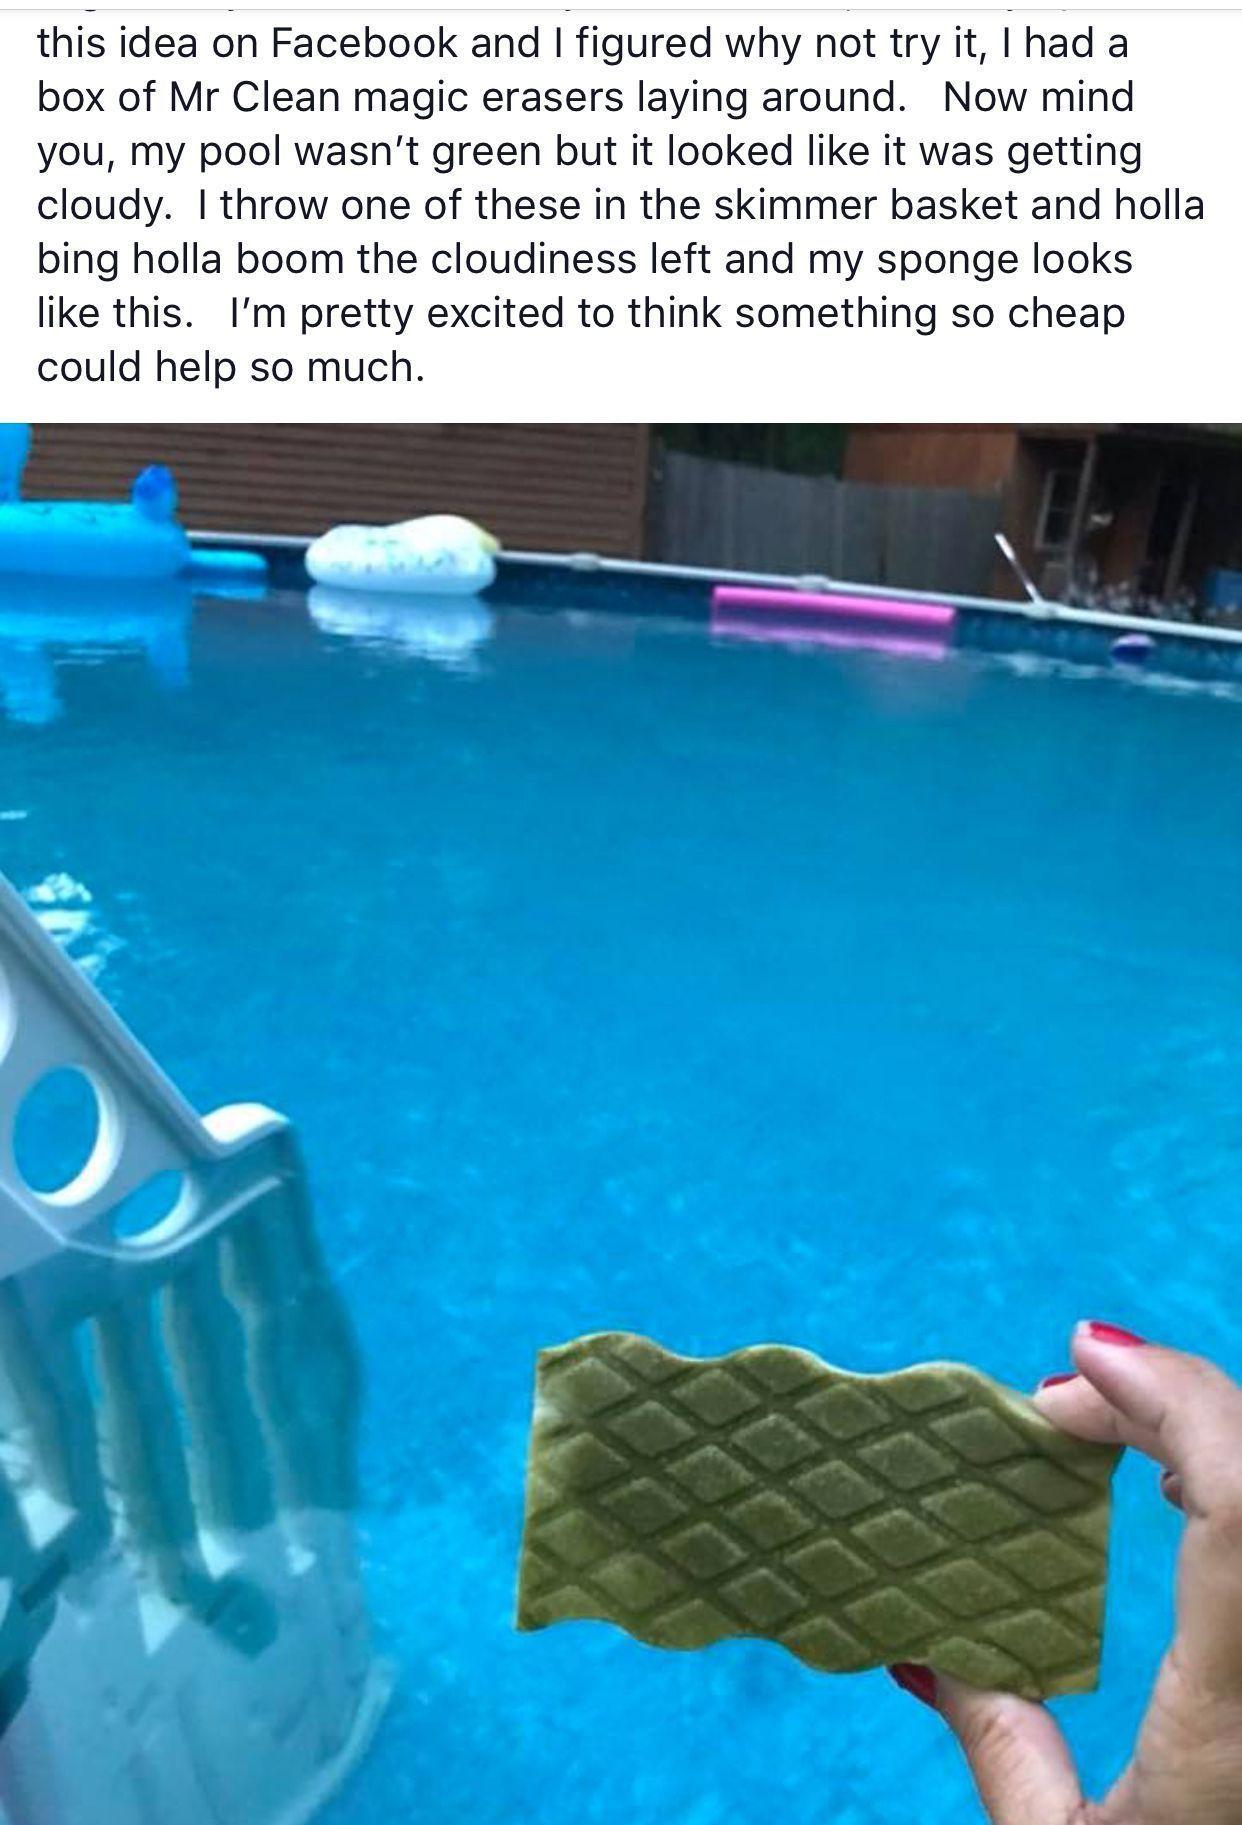 Clean A Pool With A Mr Clean Magic Eraser Arka Bahce Havuzlari Arka Bahce Havuzu Peyzaji Yuzme Havuzlari